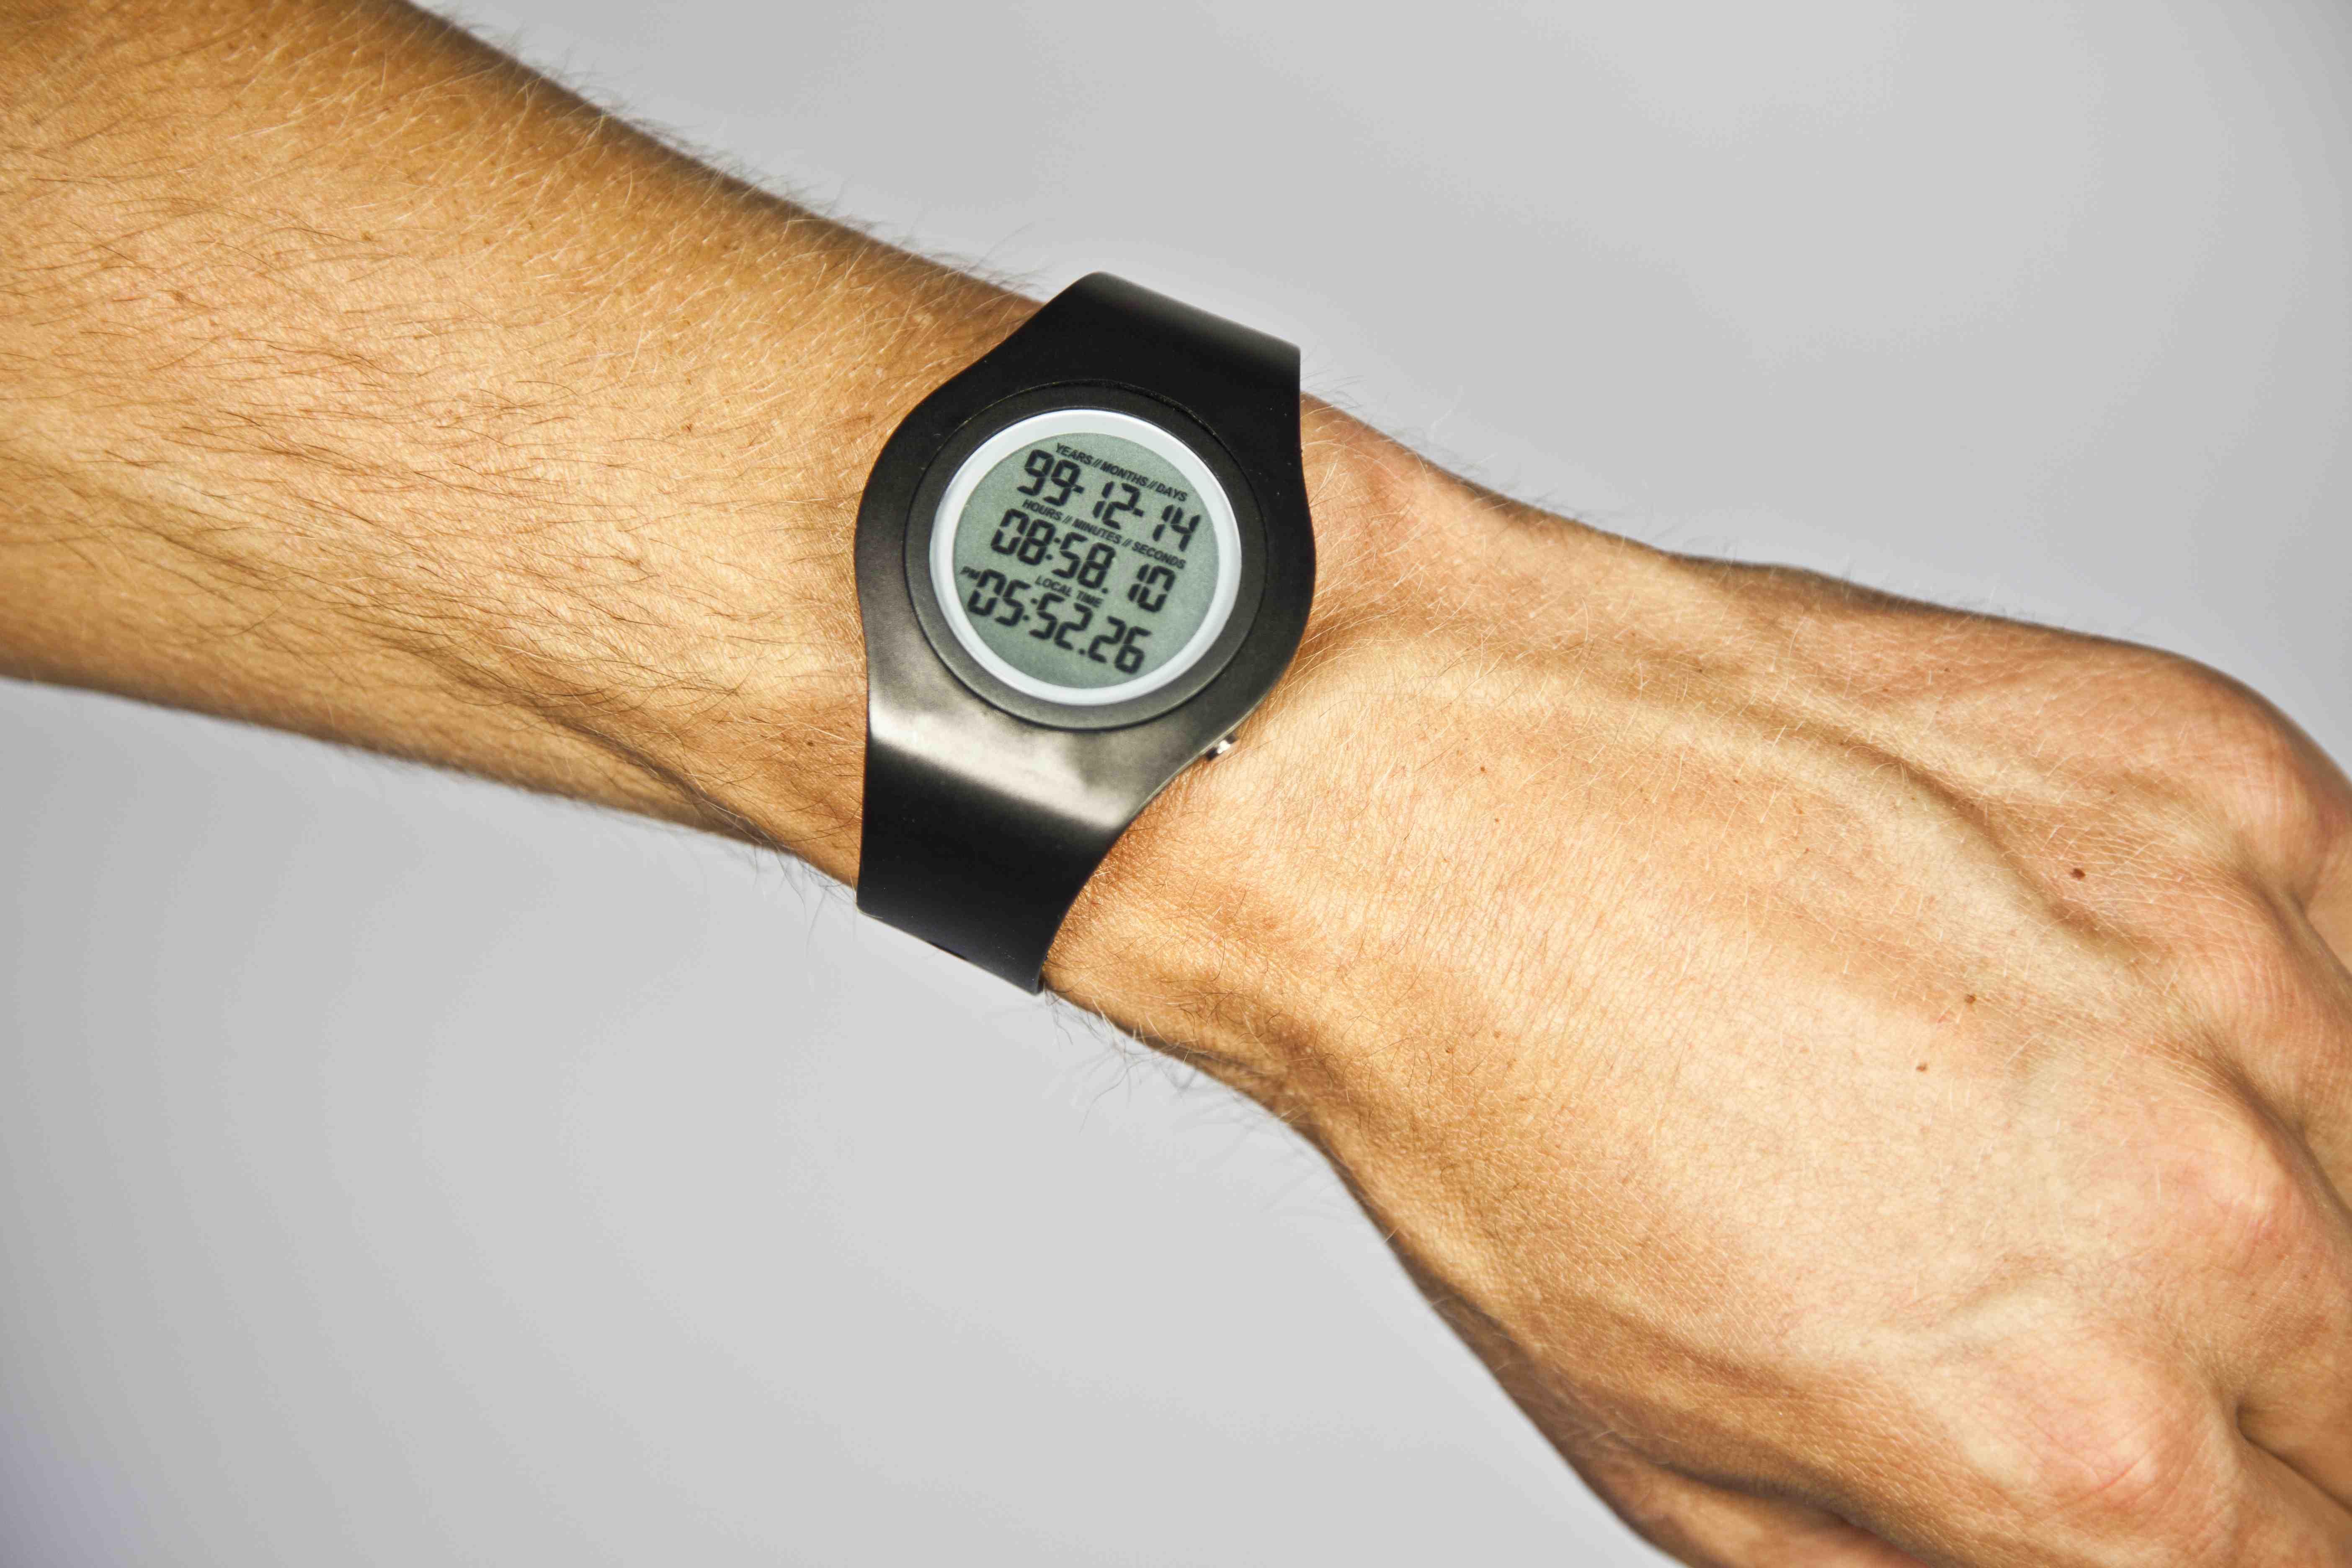 A Morbid Carpe Diem: Tikker Watch Counts Down Wearer's Life Expectancy